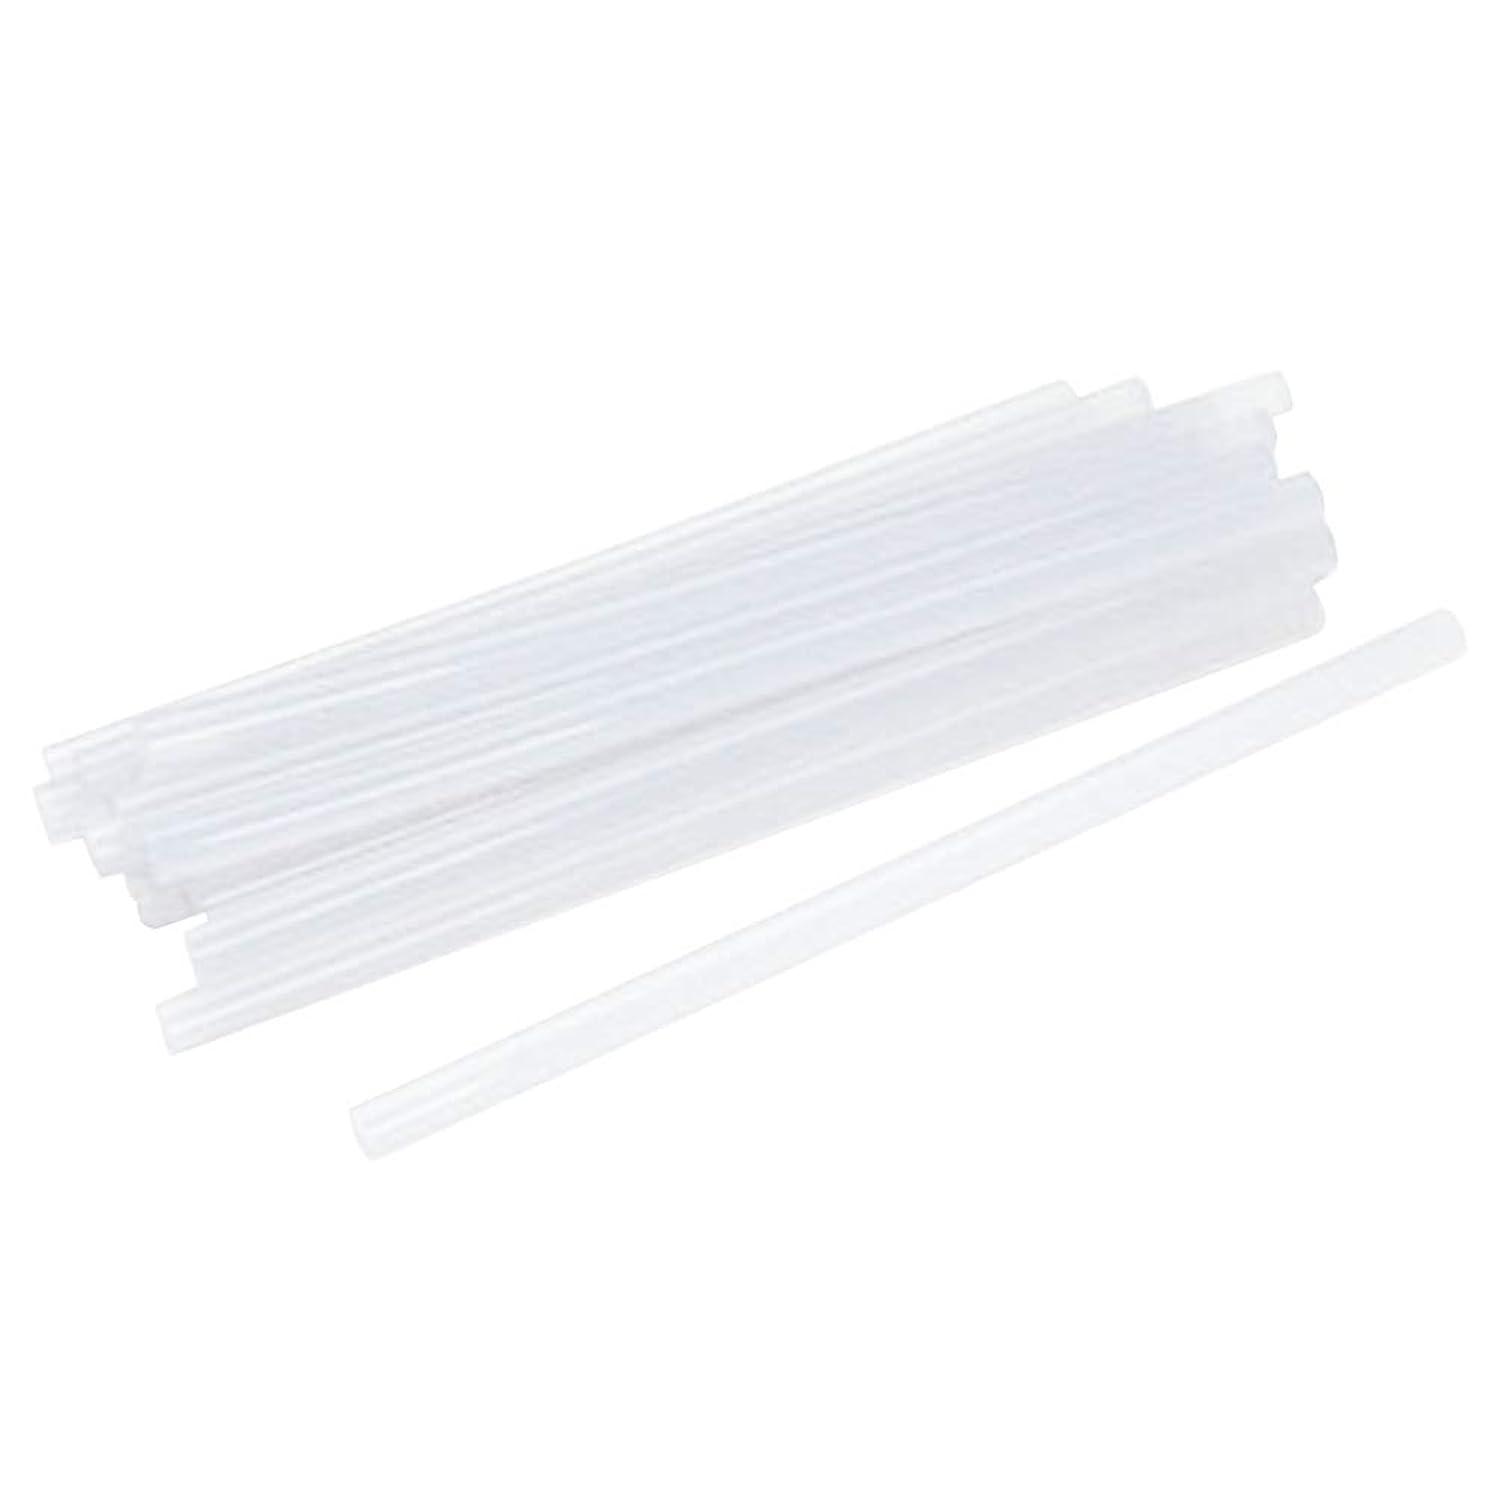 100 Hot Melt Glue Sticks 7/16